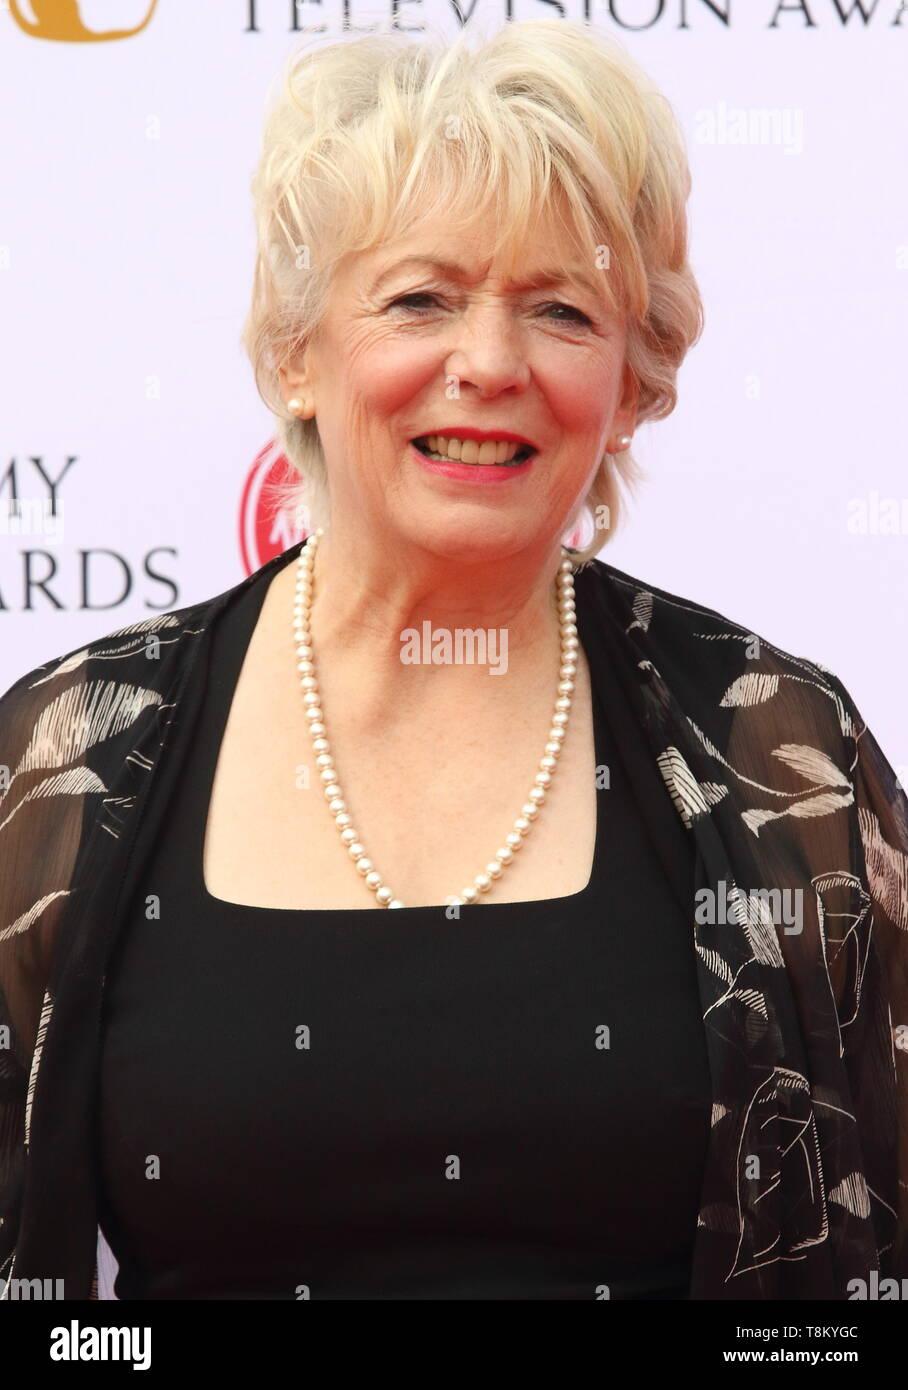 Amanda Steadman at the royal festival hall in london stock photos & at the